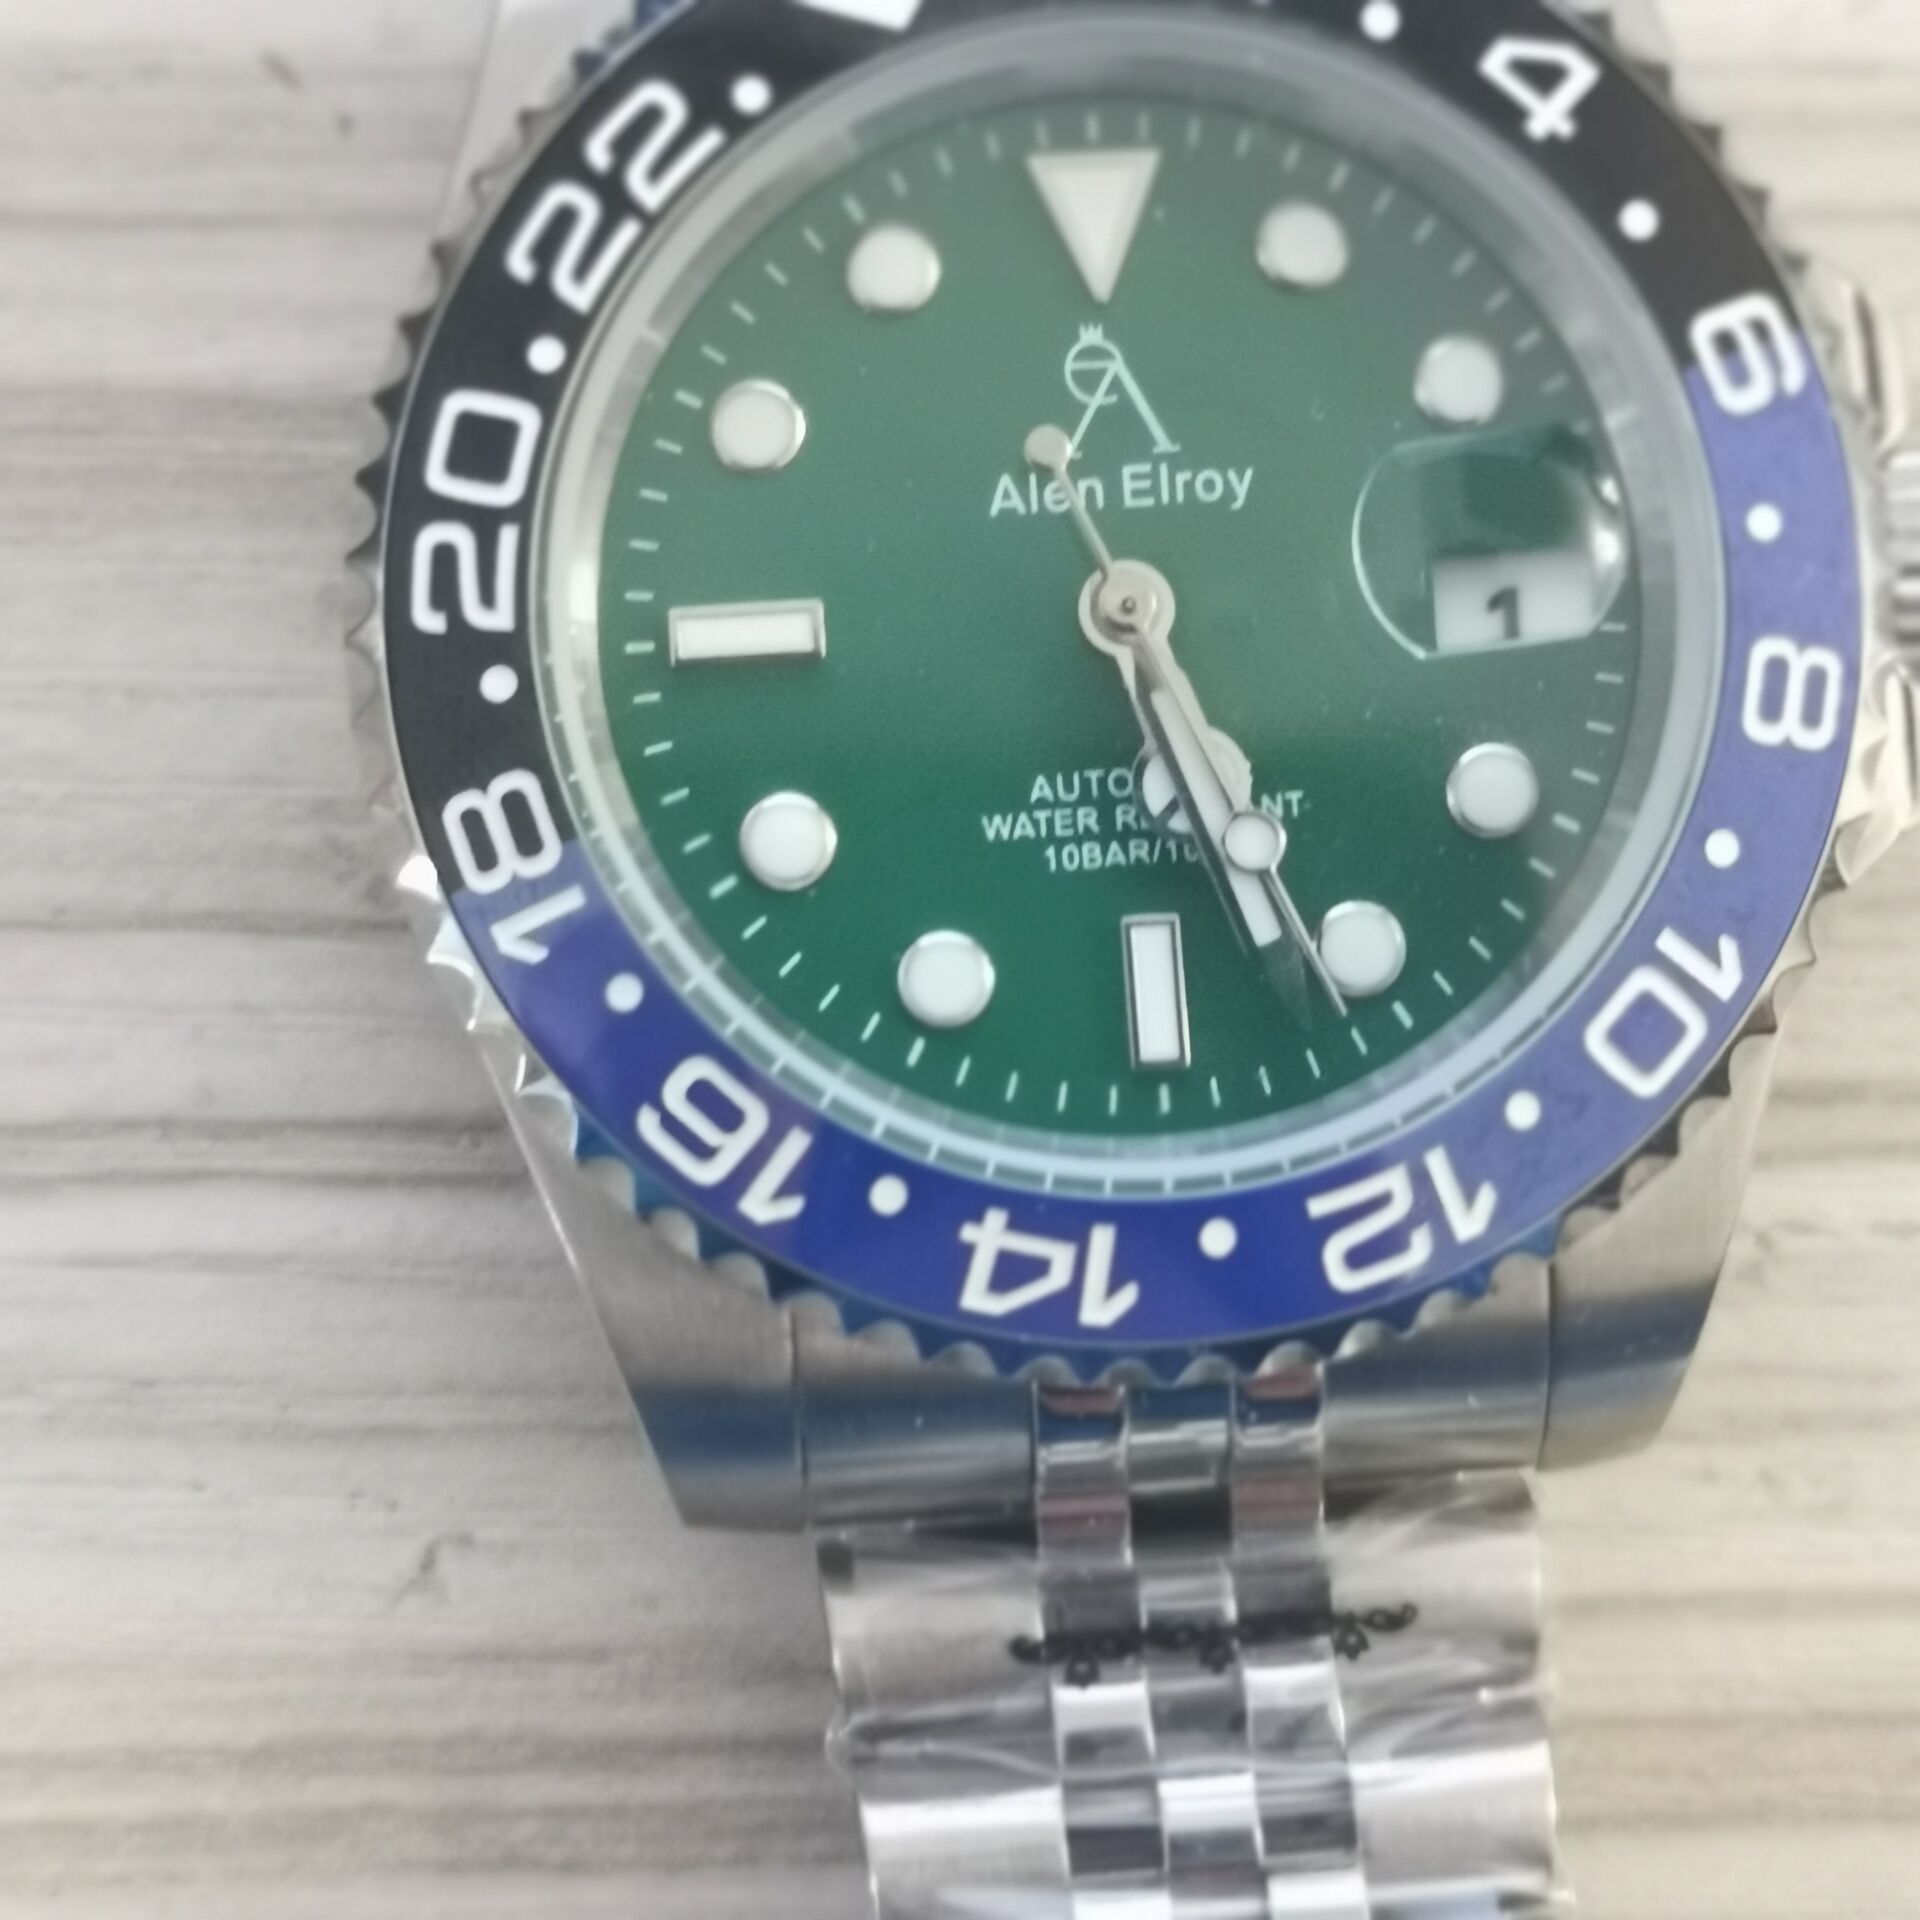 AE High-end watches men's automatic U1 factory ceramic bezel sapphire glass luminous needle sweep movement luxury green sub